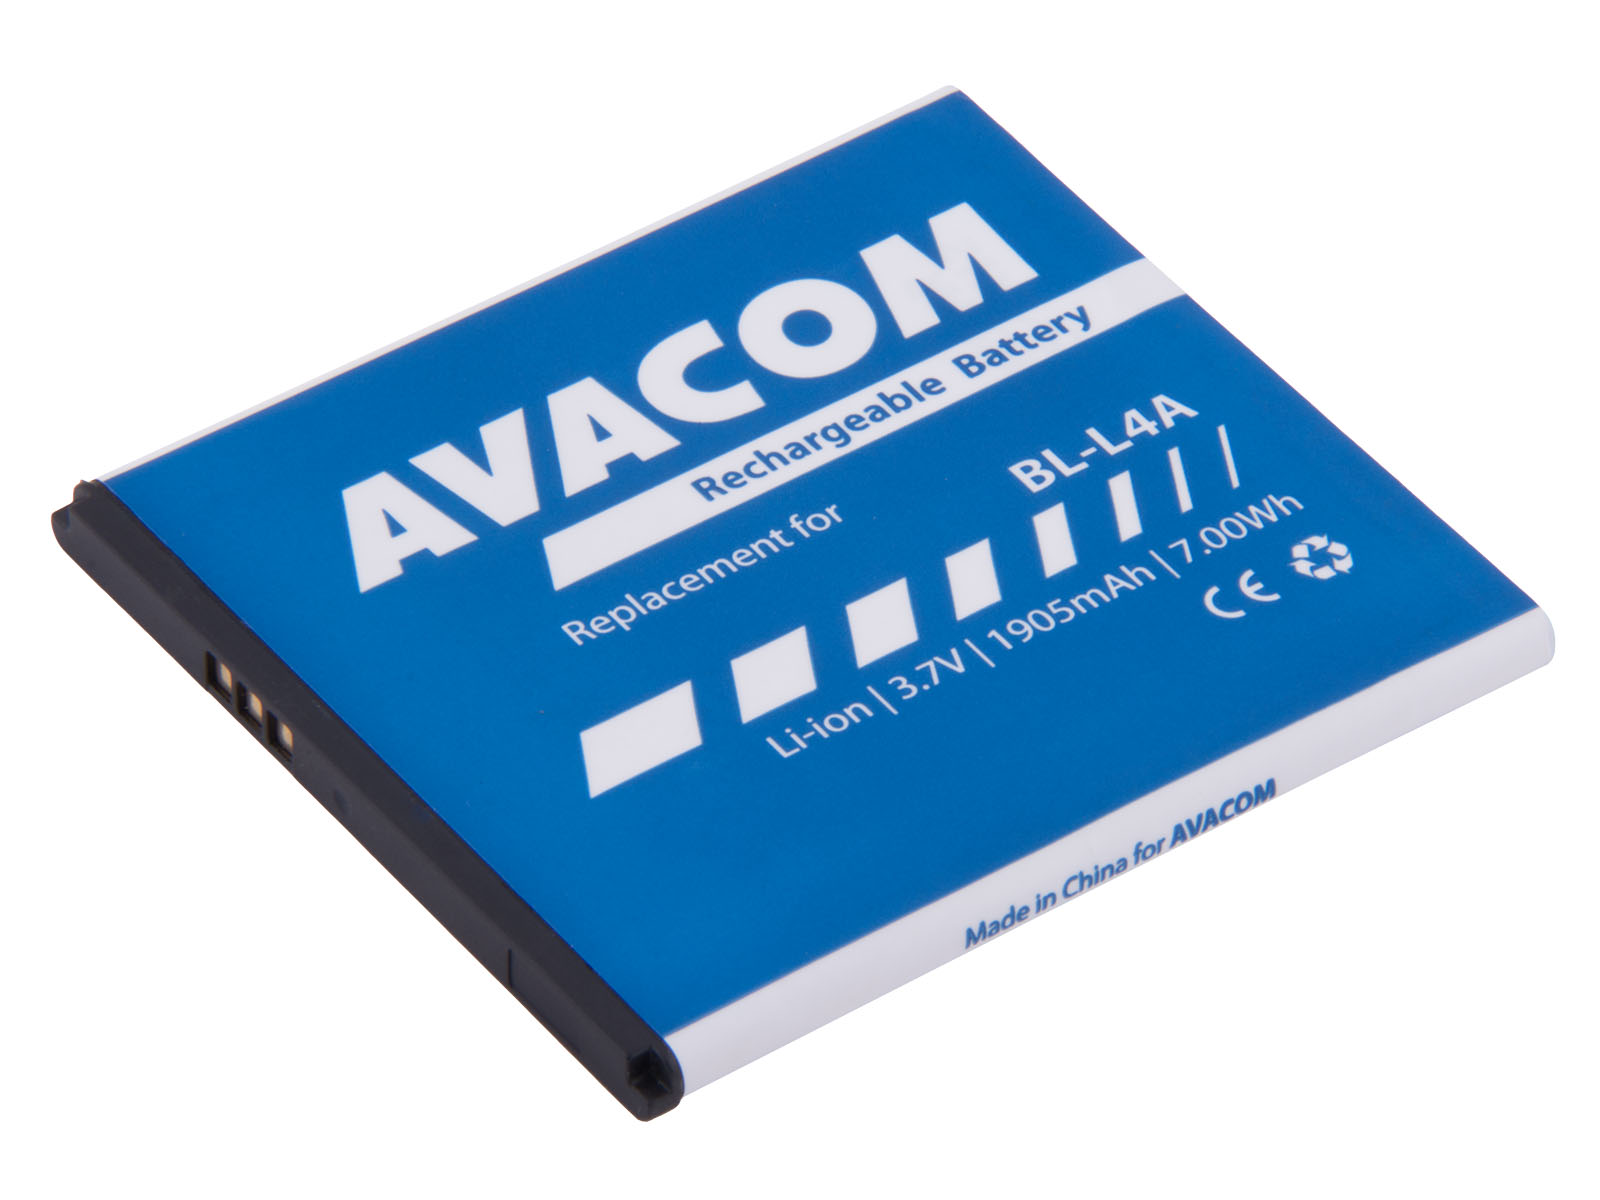 Baterie AVACOM GSNO-BL4A-1905 do mobilu Microsoft Lumia 535 Li-ion 3,7V 1905mAh (náhrada BL-L4A)